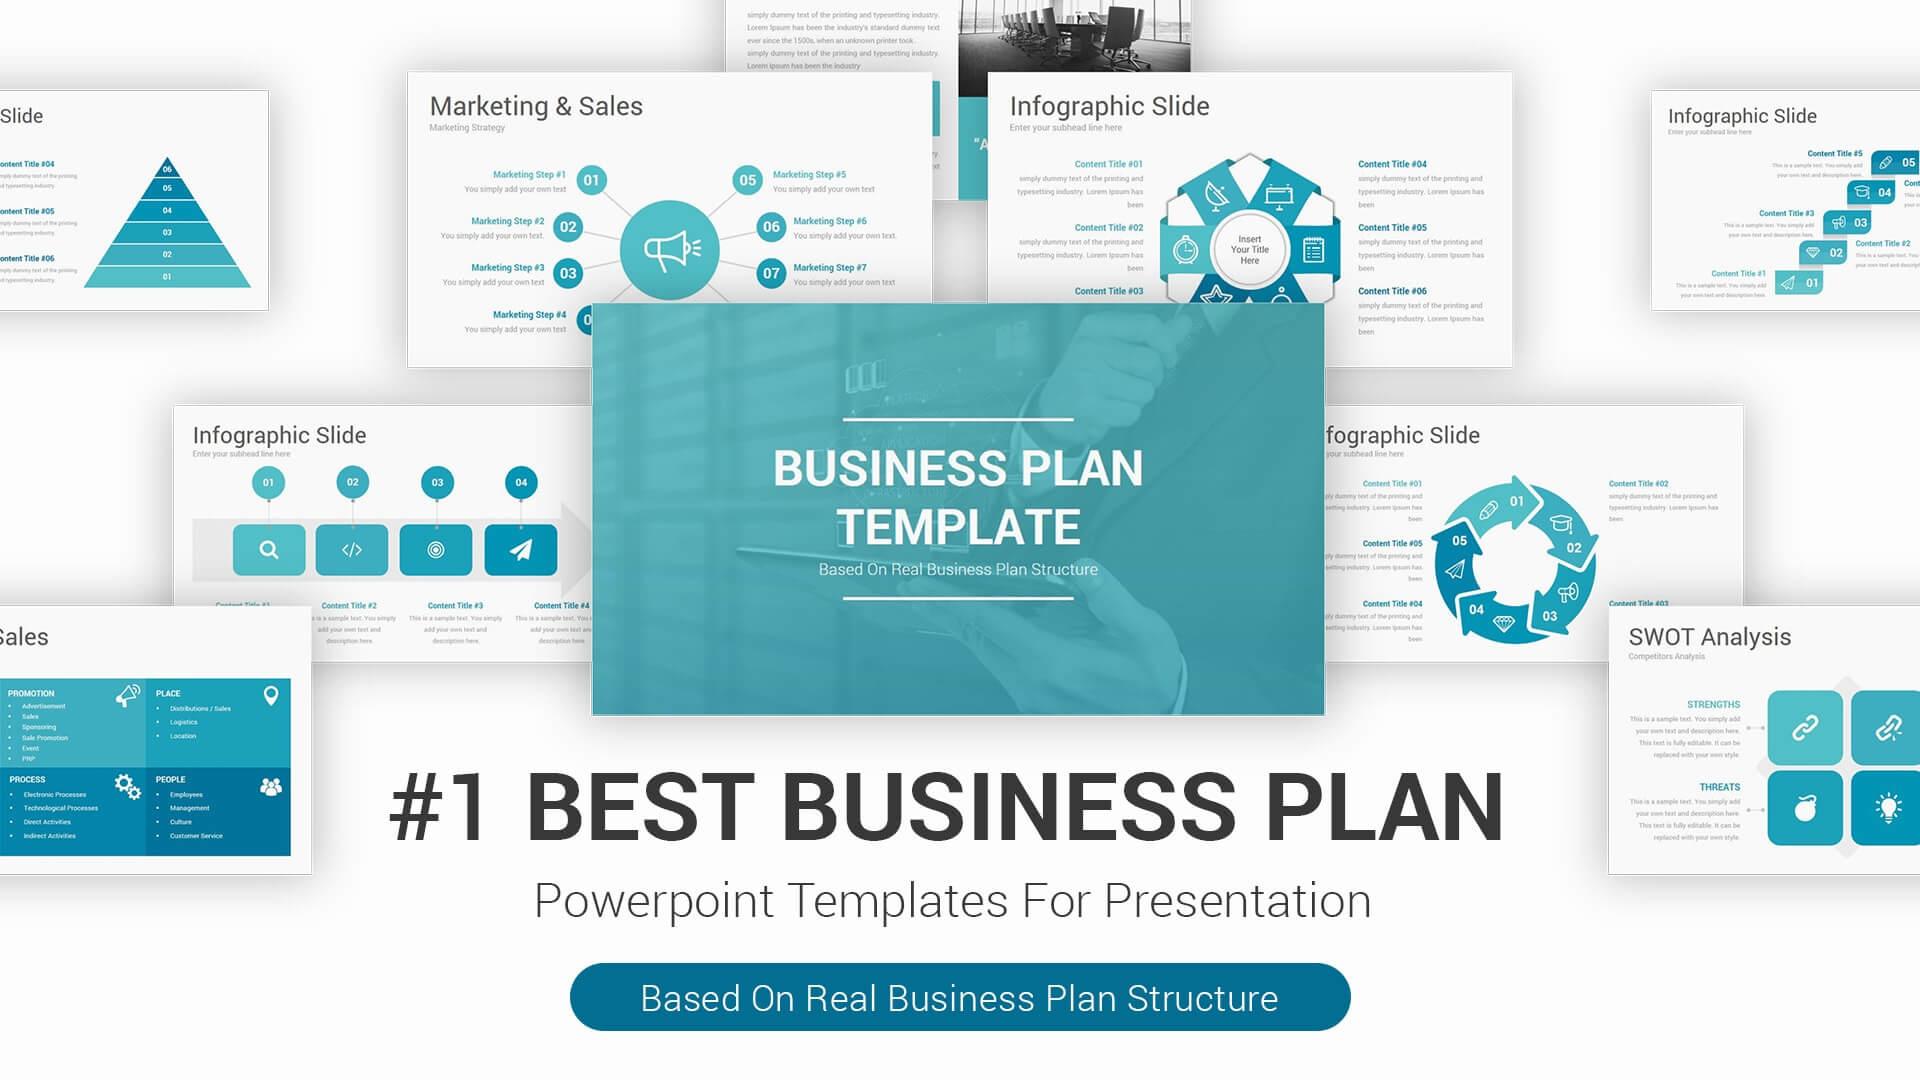 Best Business Plan Powerpoint Presentation Templates, 2020 Intended For Business Plan Presentation Template Ppt